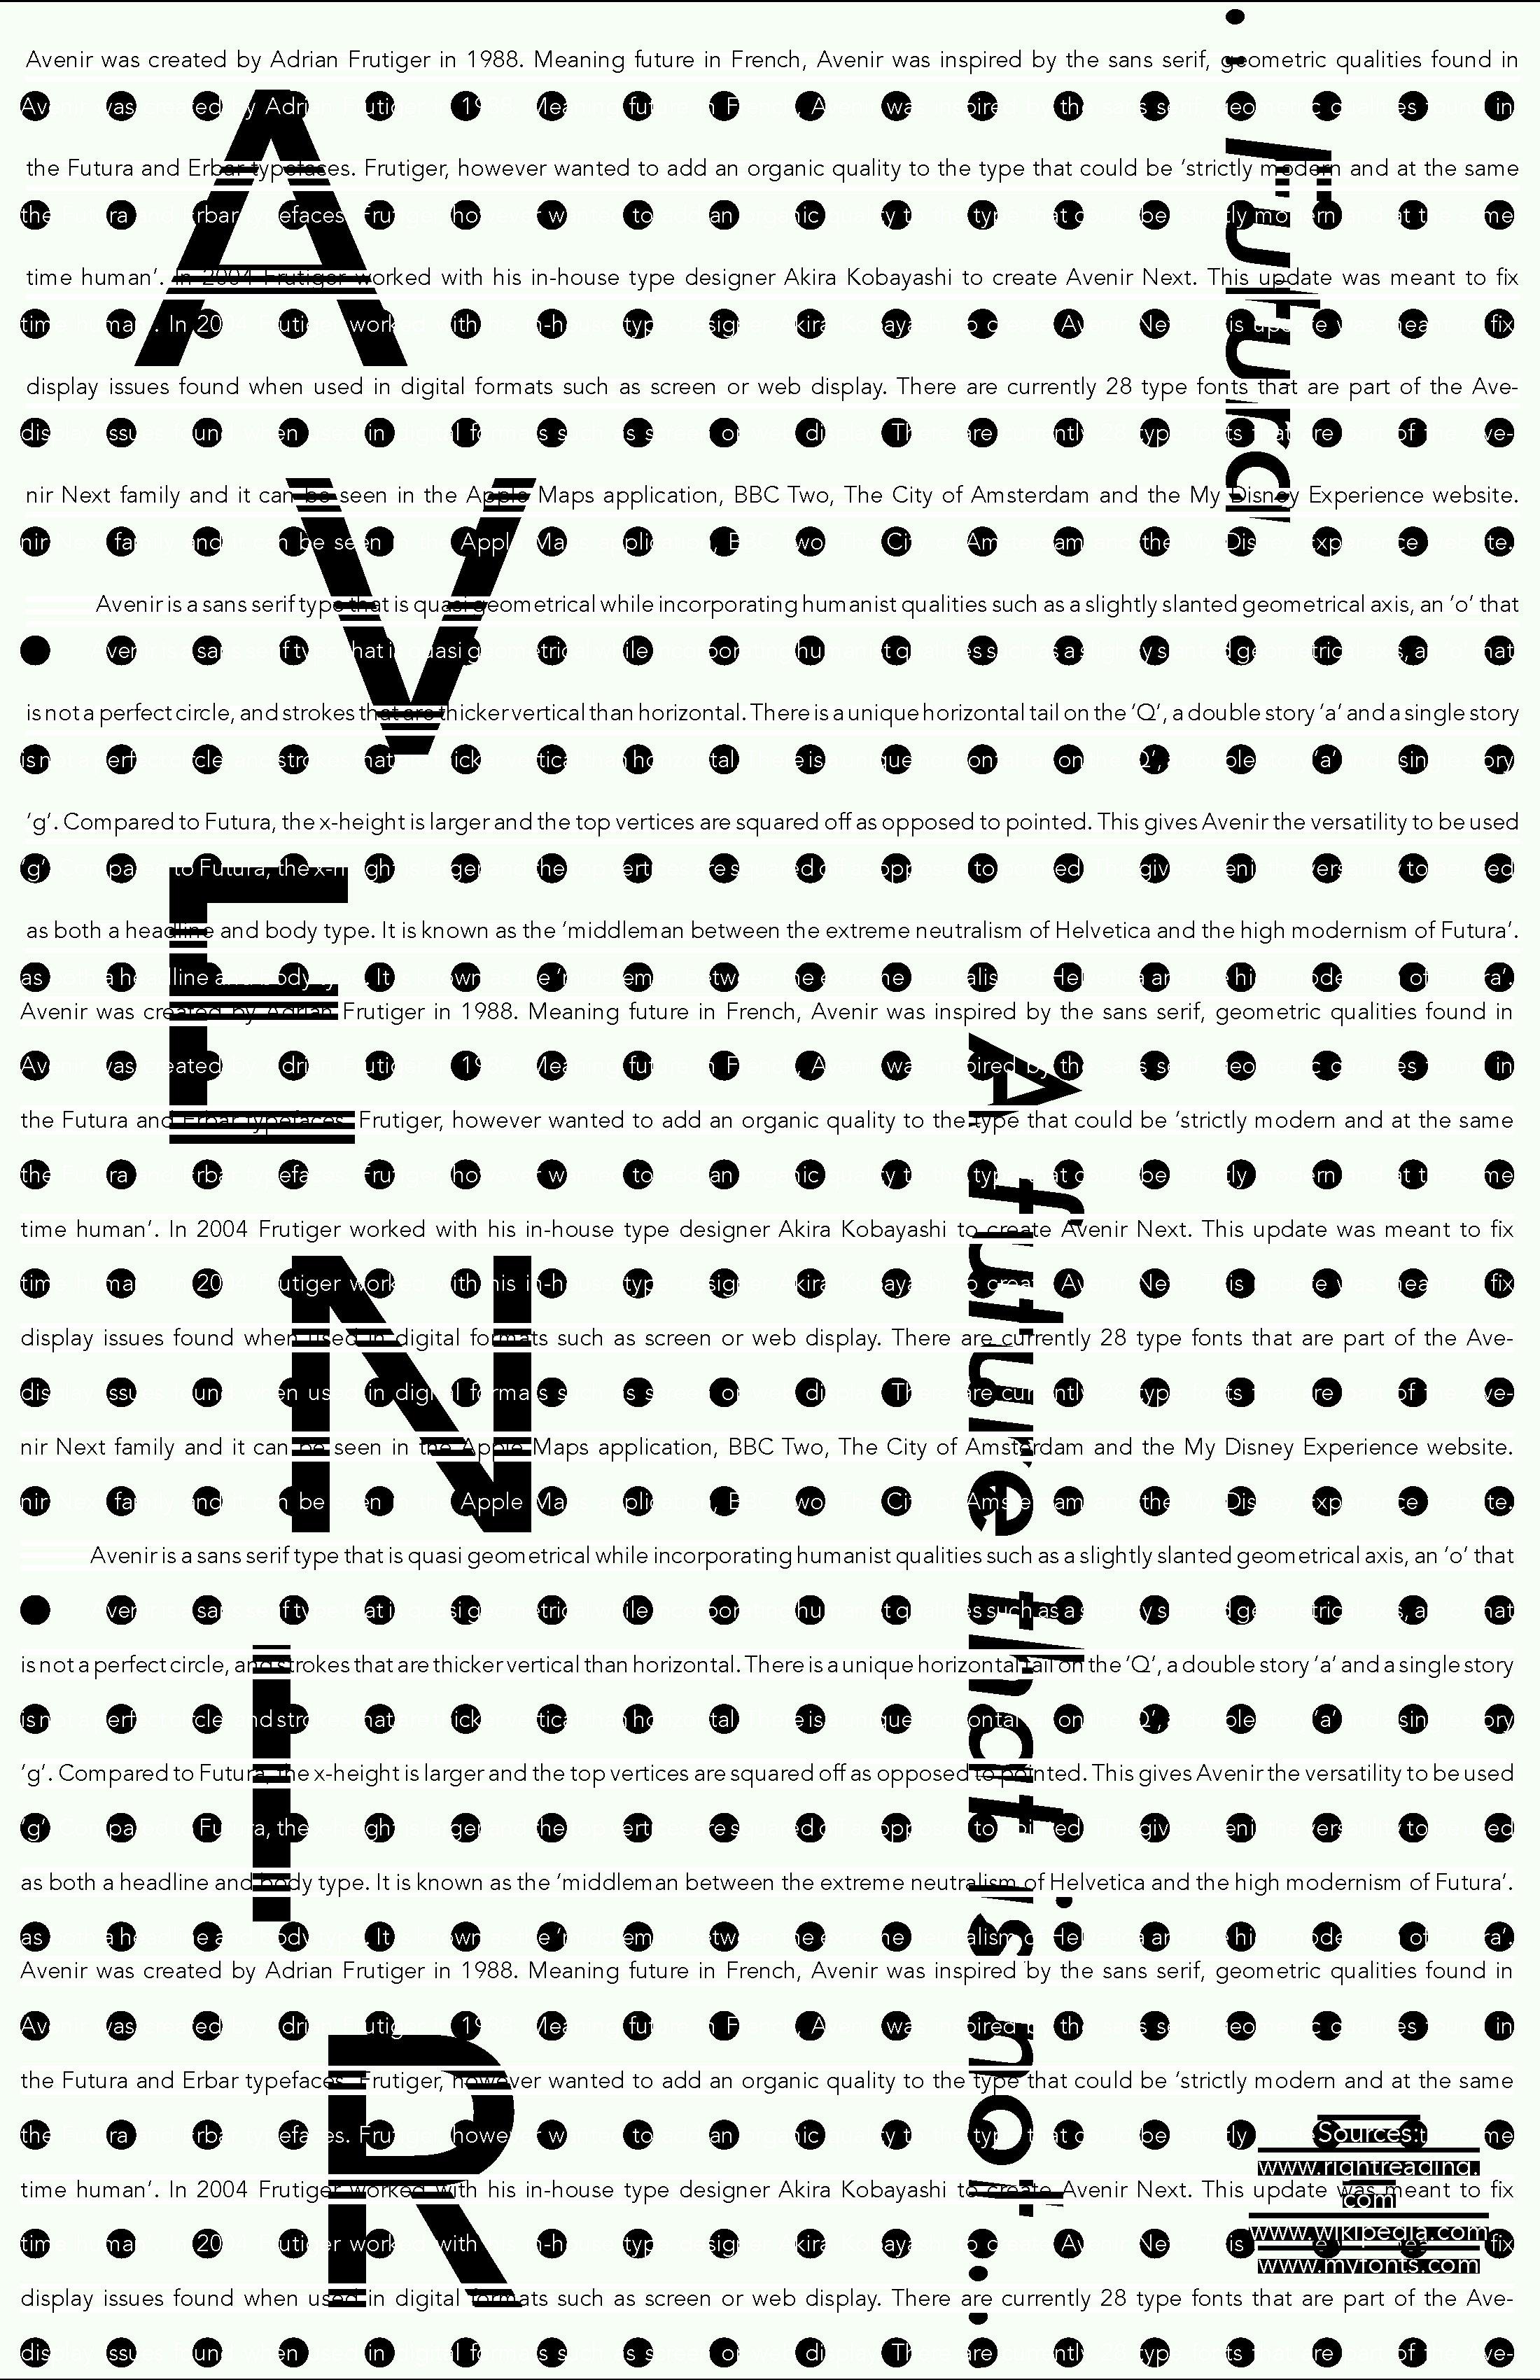 Avenir Poster_Page_6.jpg